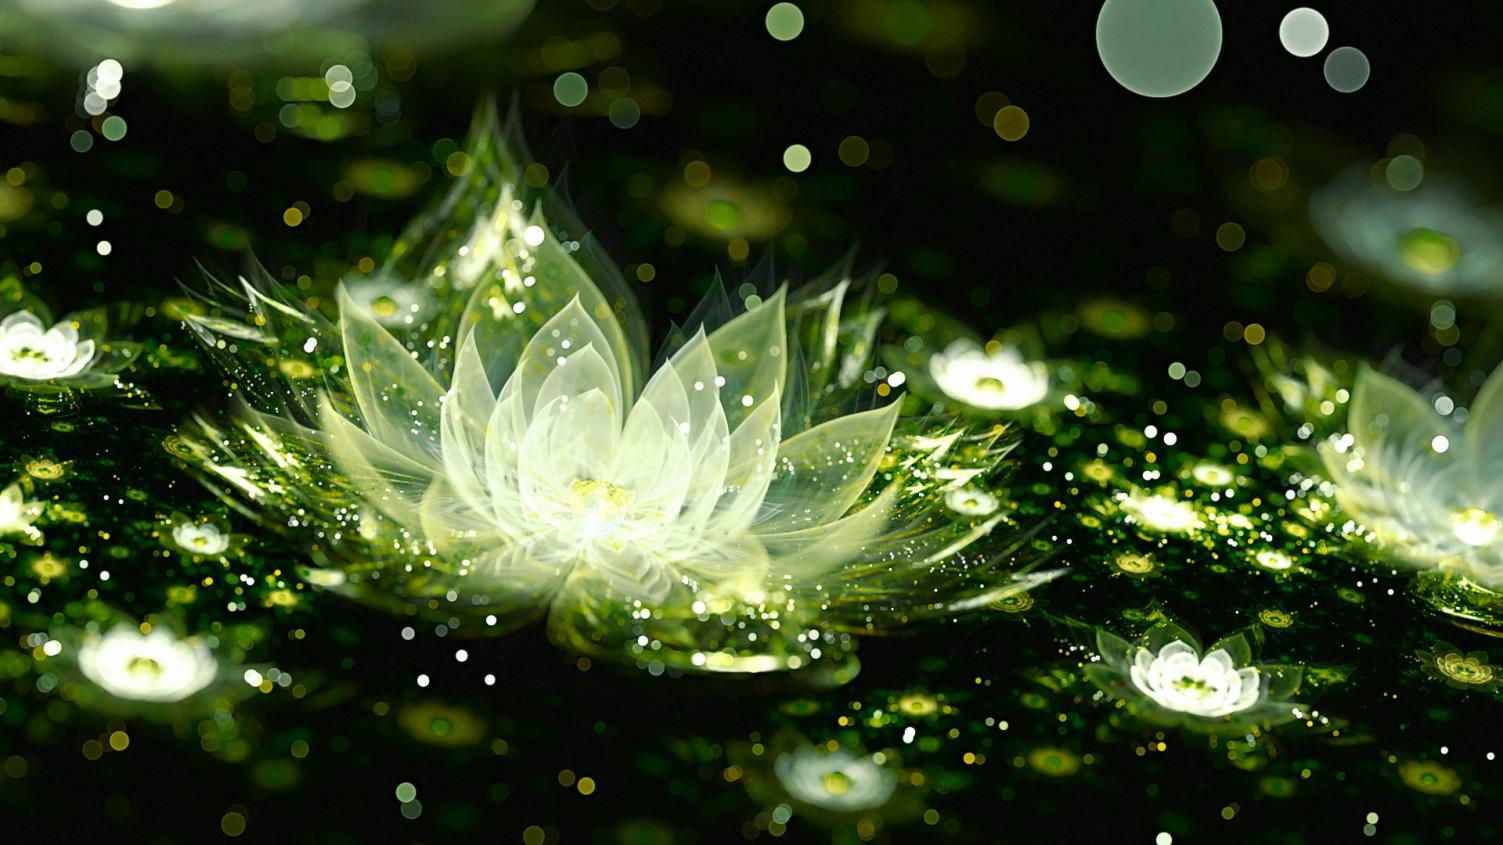 http://img3.goodfon.ru/original/1503x845/9/7e/3d-grafika-cvety-lilii-boke.jpg